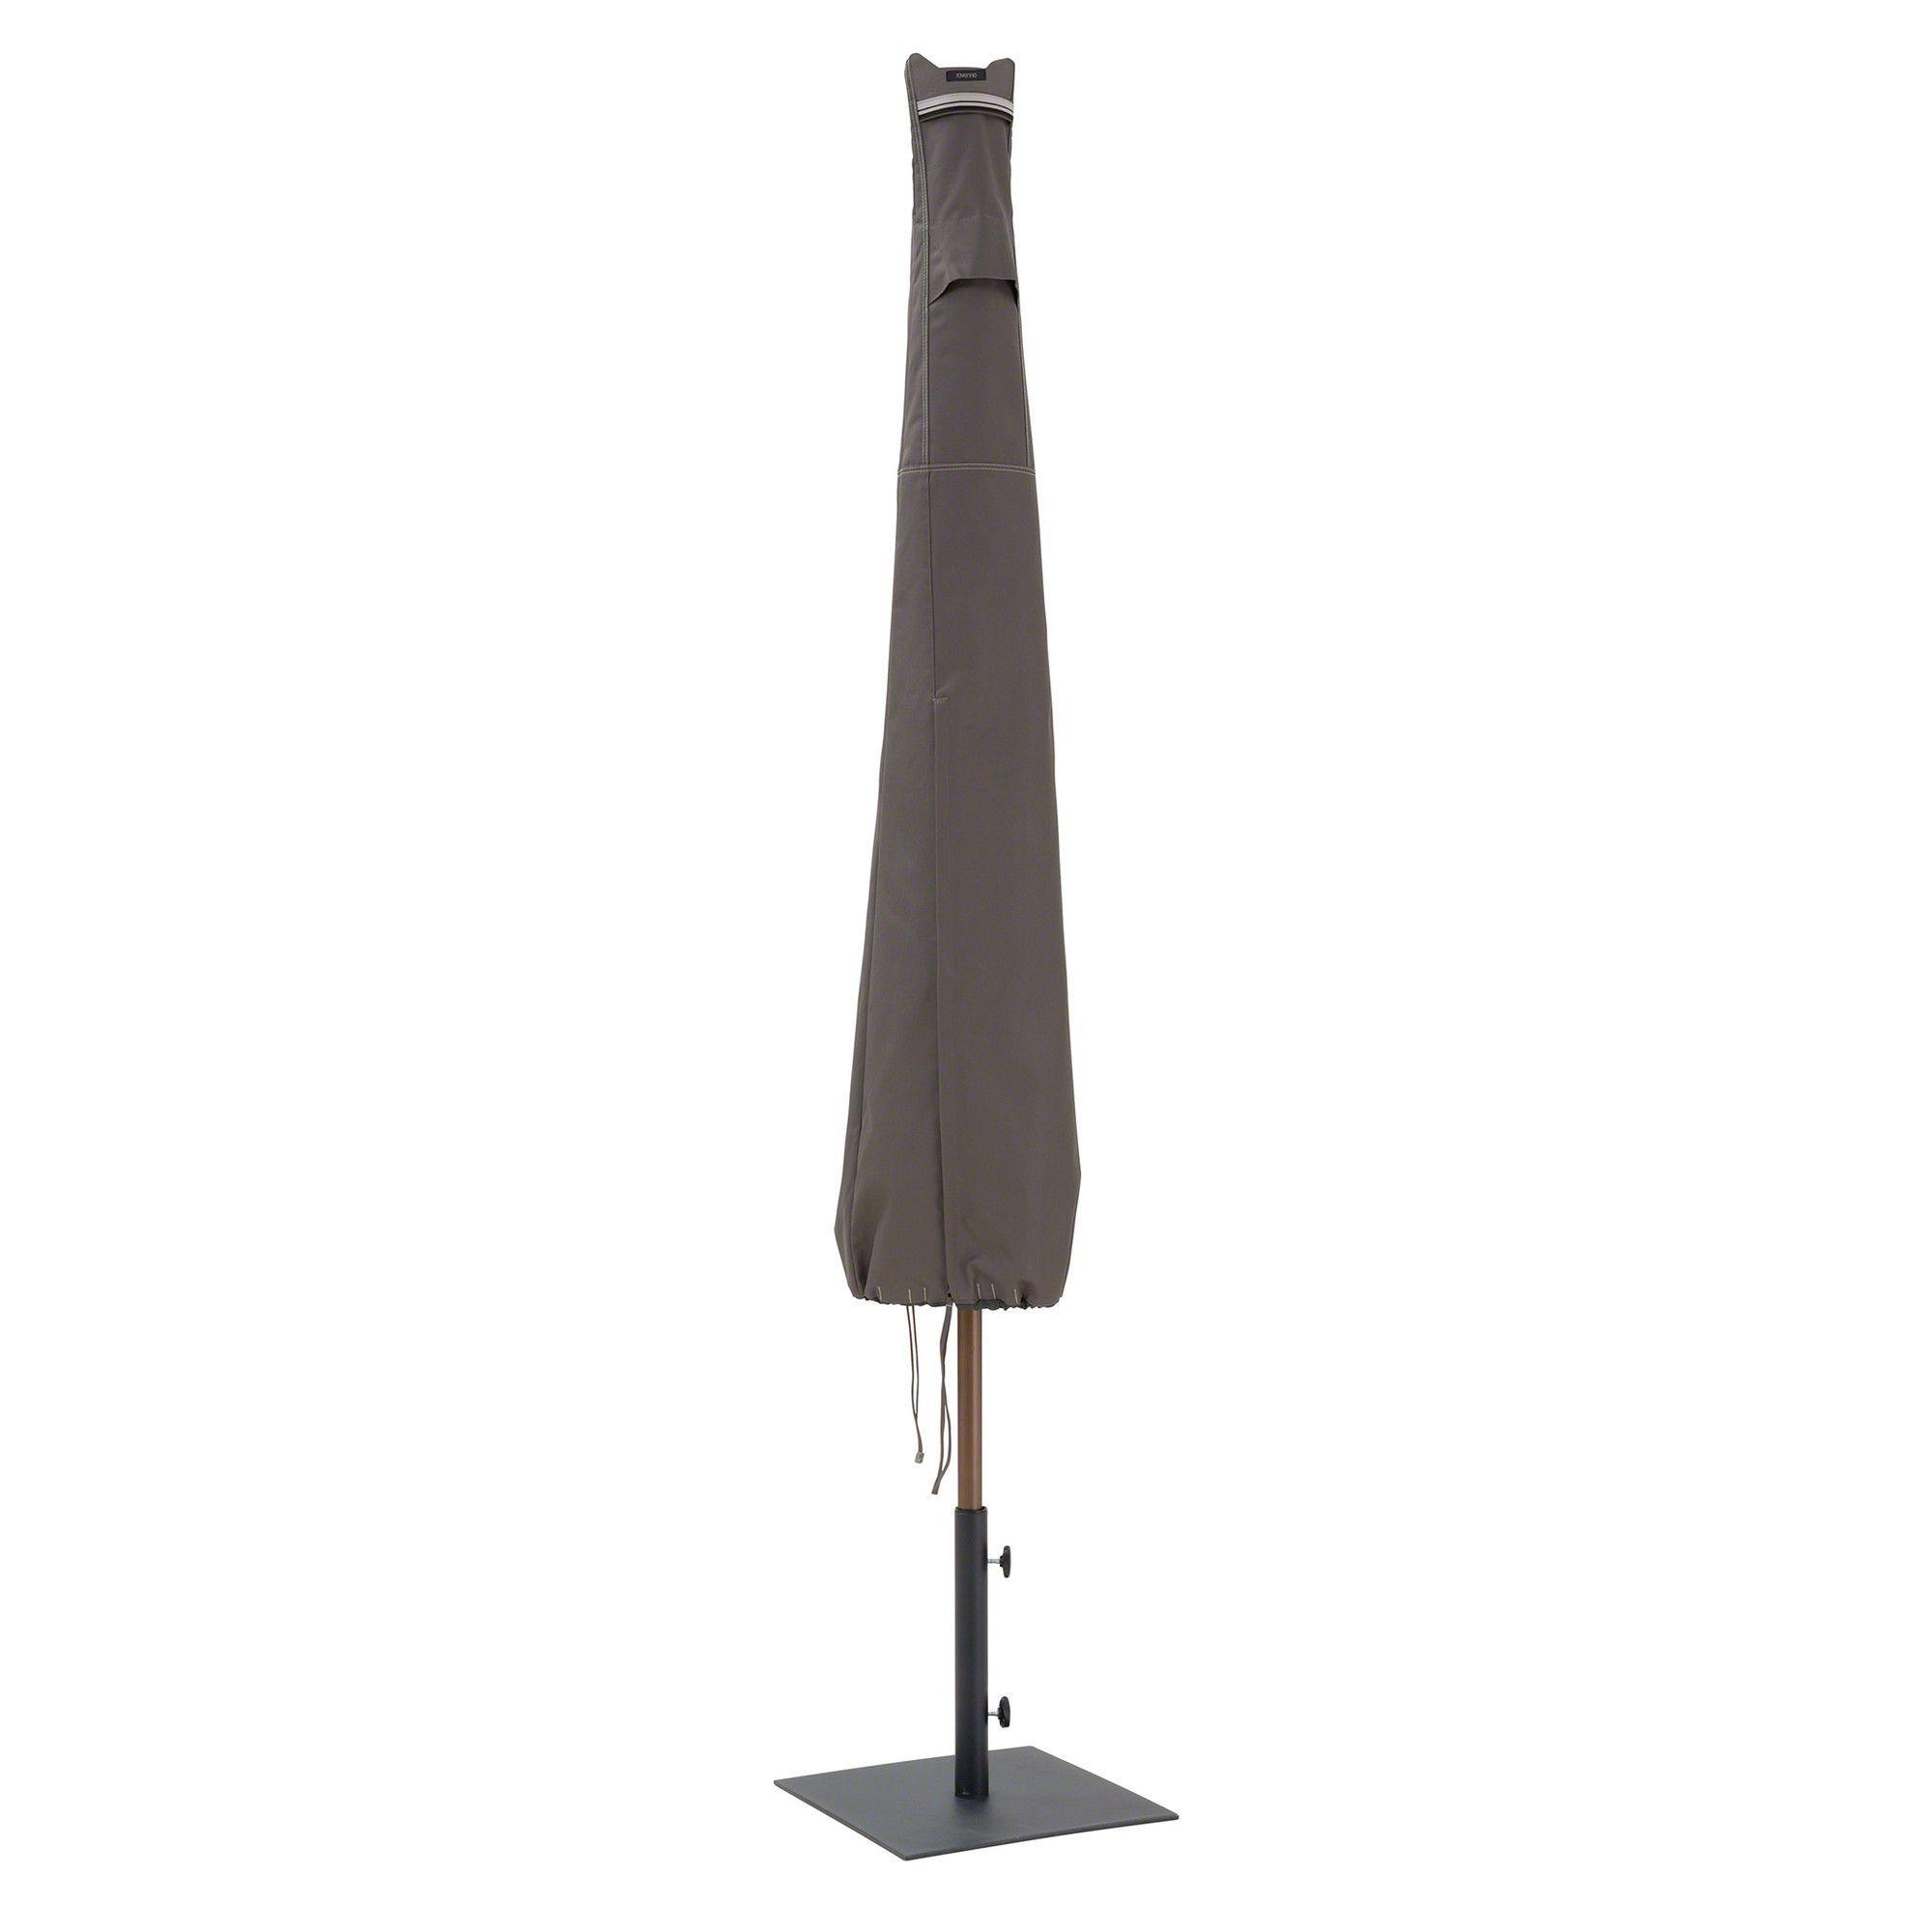 Ravenna Patio Umbrella Cover